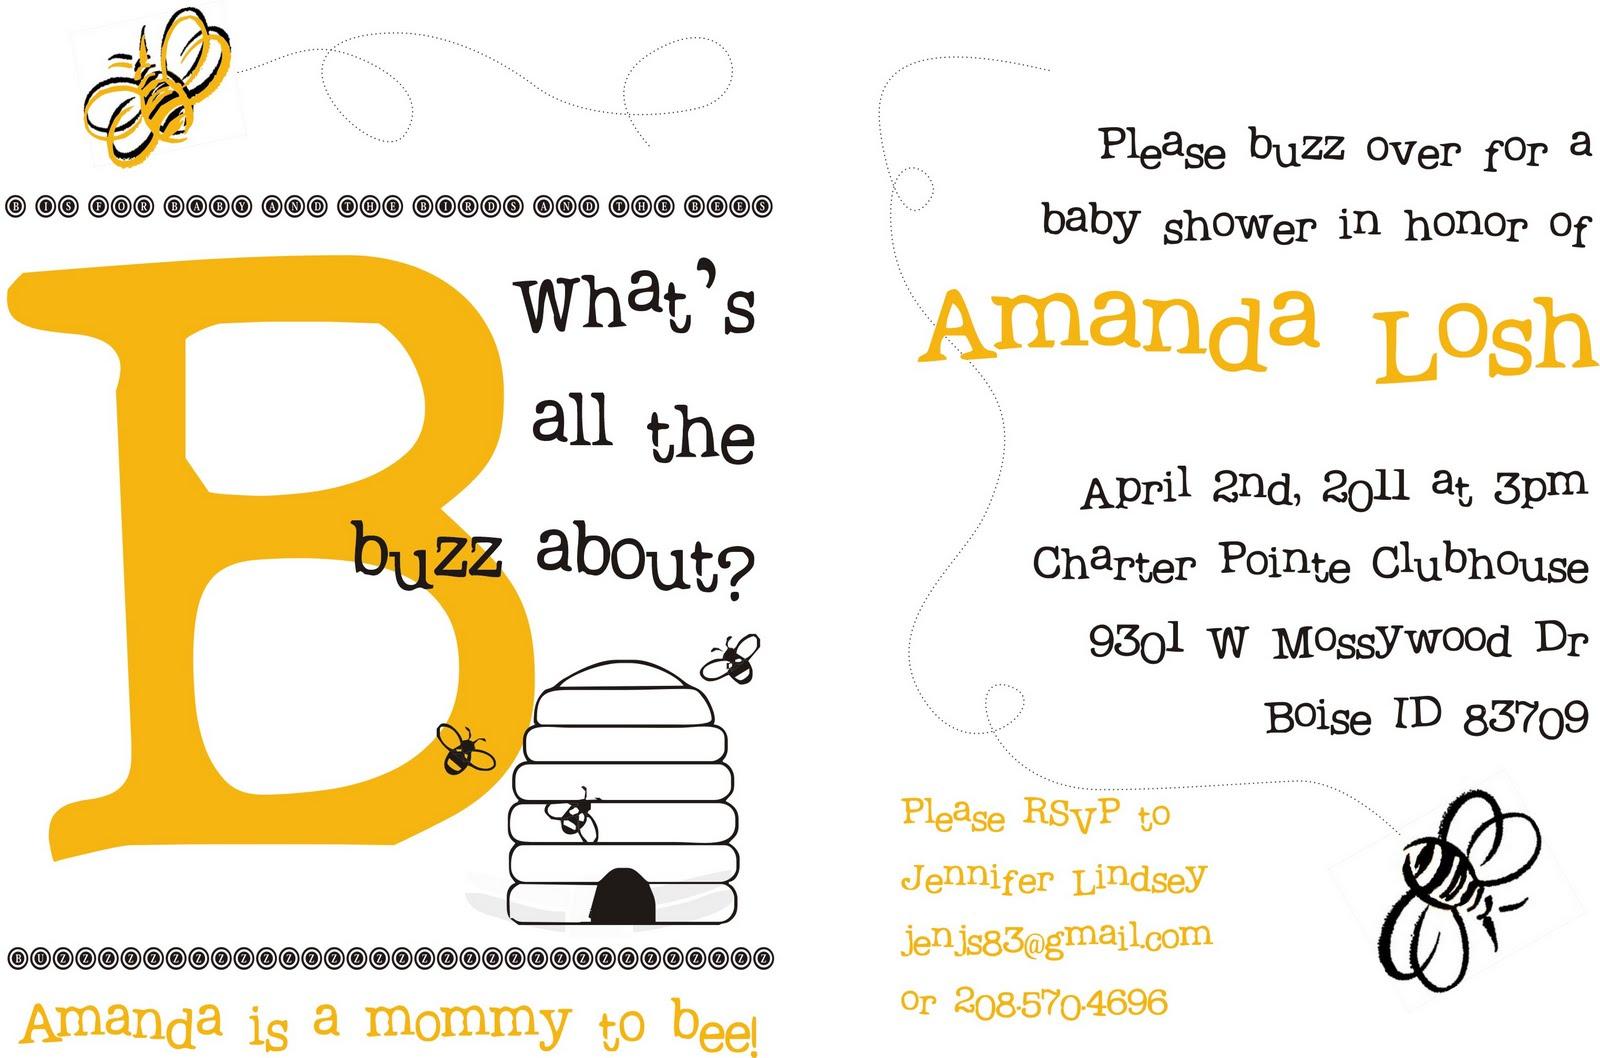 Wedding Themes - Wedding Style: Baby Shower - Bumble Bee Theme